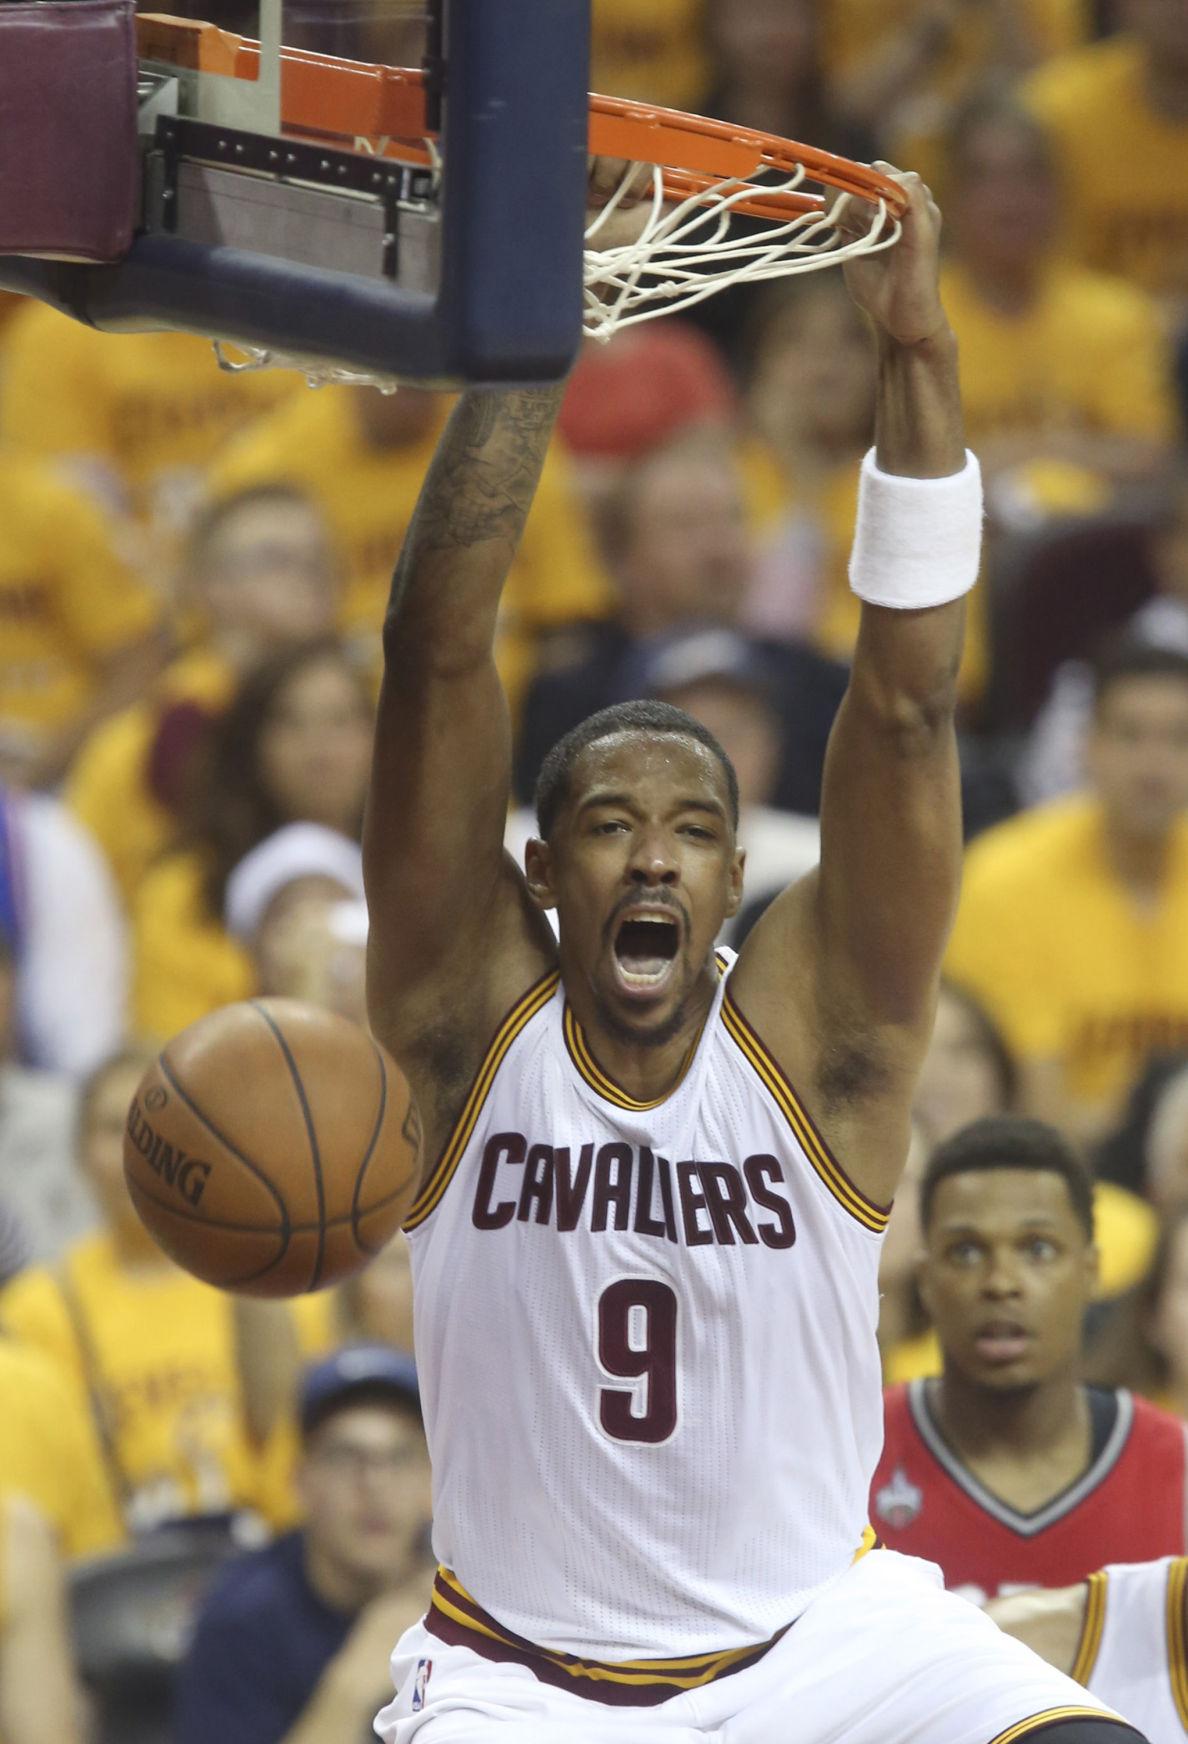 All Arizona Nba Finals Will Have Lute Fans Riveted Arizona Wildcats Basketball Tucson Com